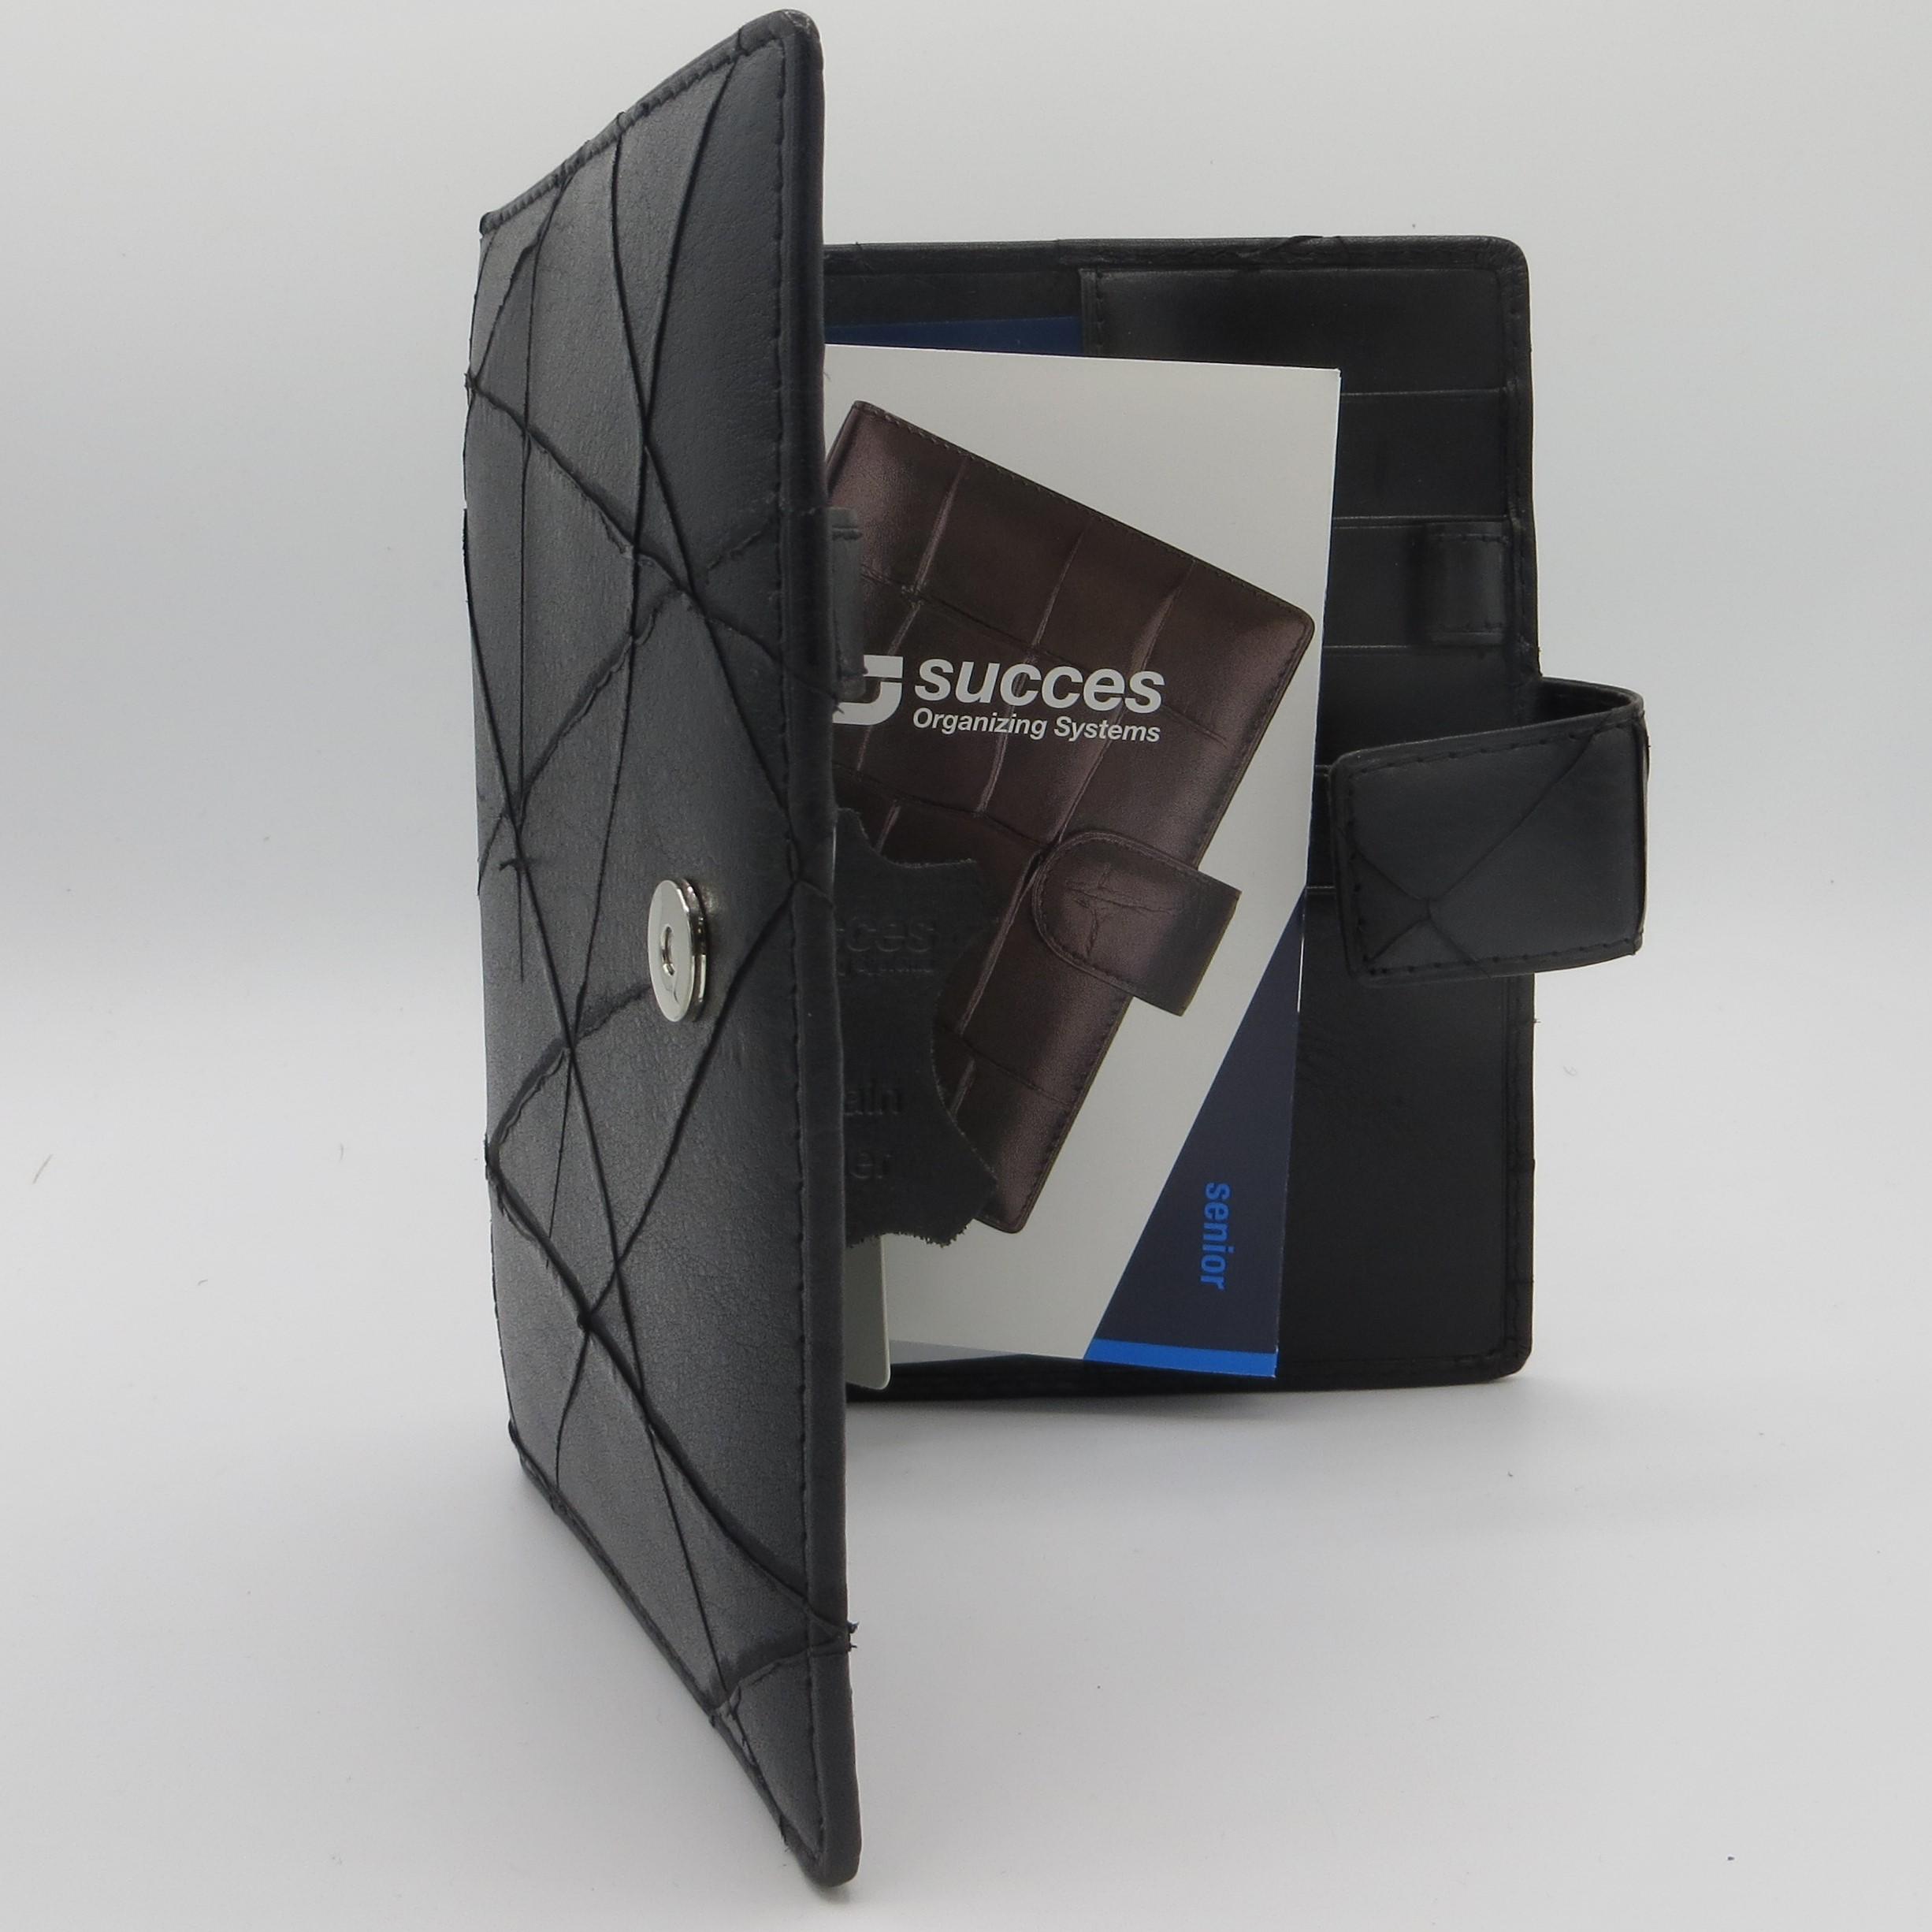 Ps326sc02,Succes agendaomslag senior scratch zwart 25 mm